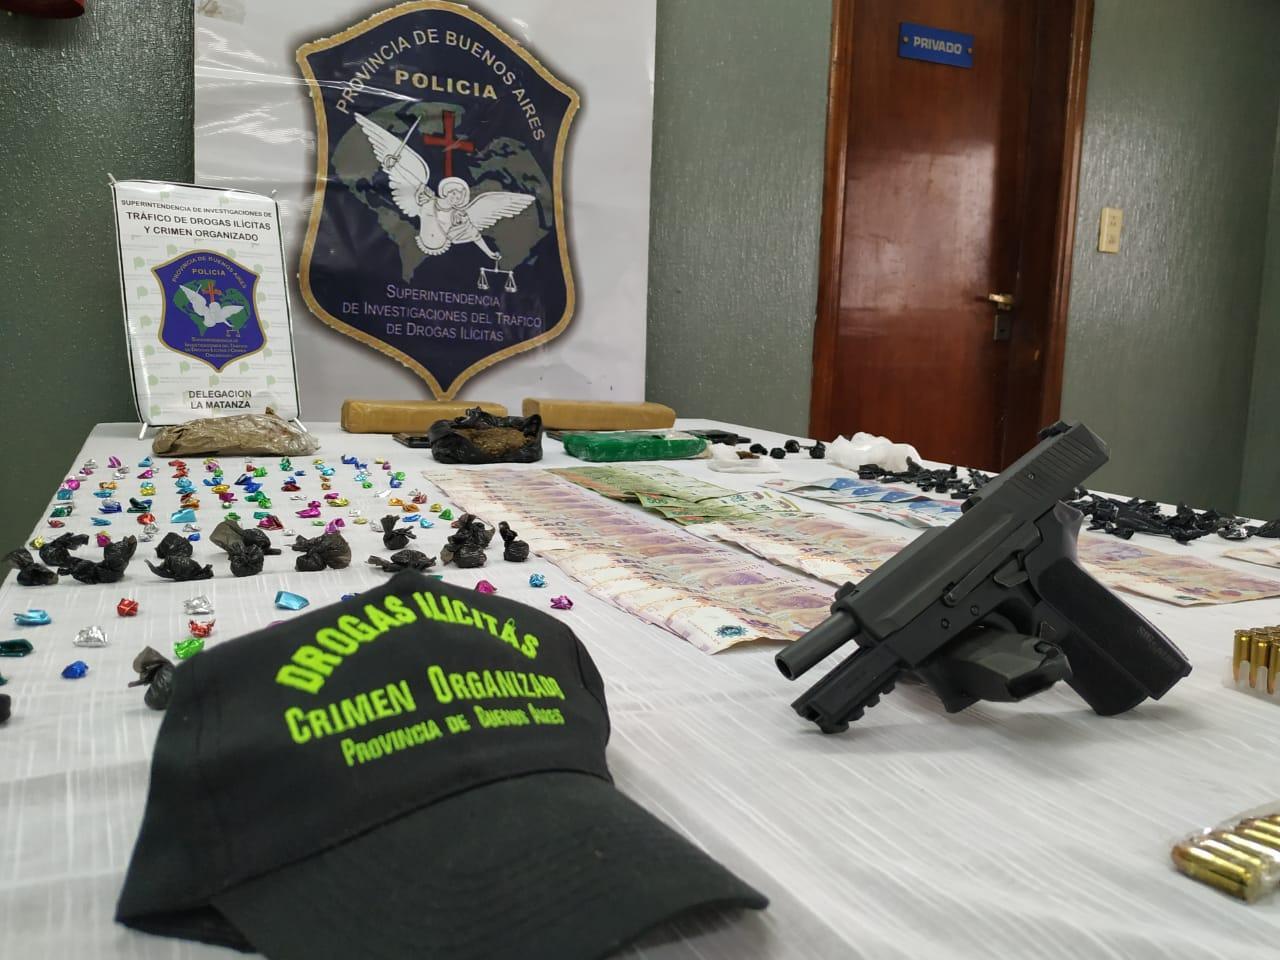 Cae banda narco liderada por jubilado que cruzaba un río en tirolesa para vender drogas en La Matanza